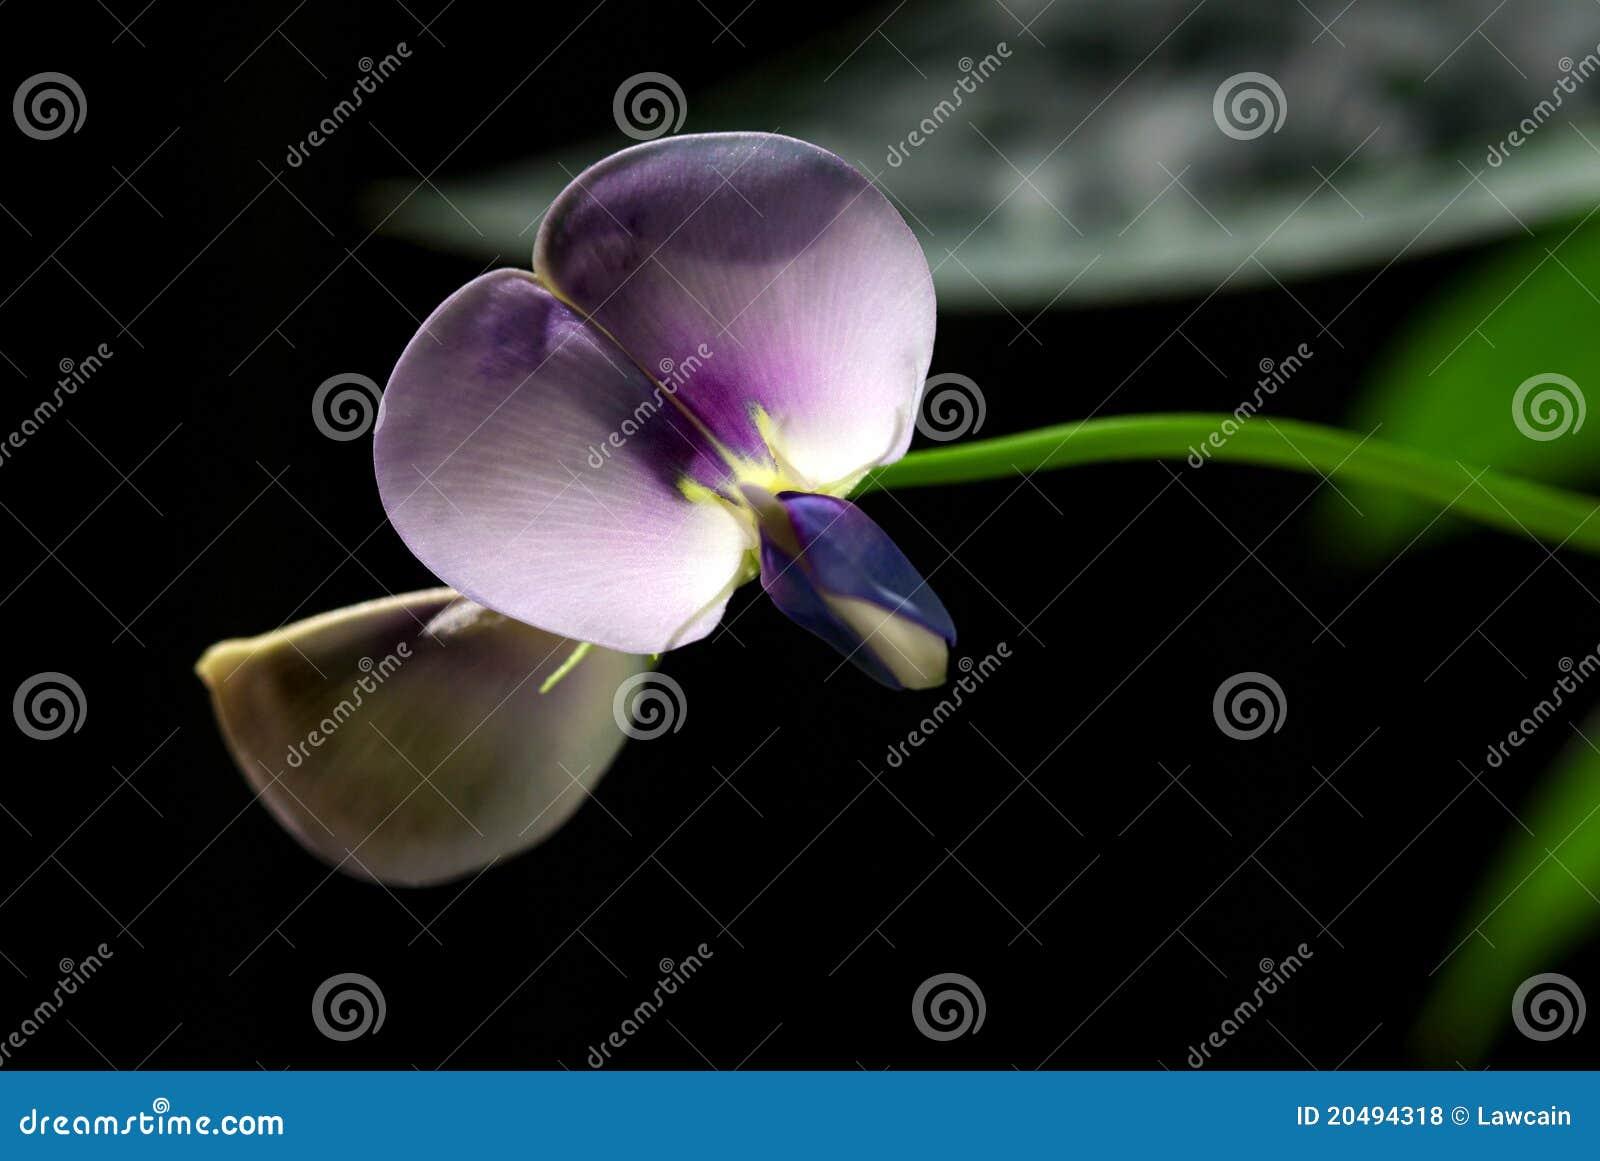 Yard Long Bean Blossom